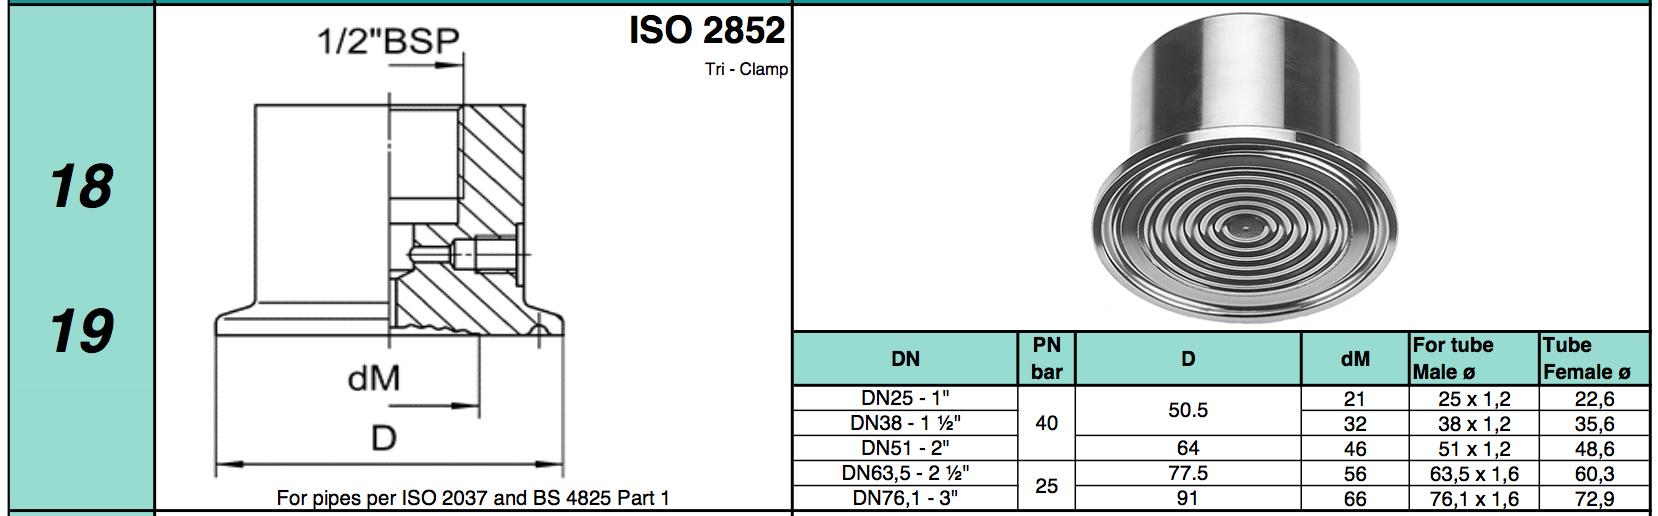 chuẩn kết nối dạng Tri Clamp ISO 2852